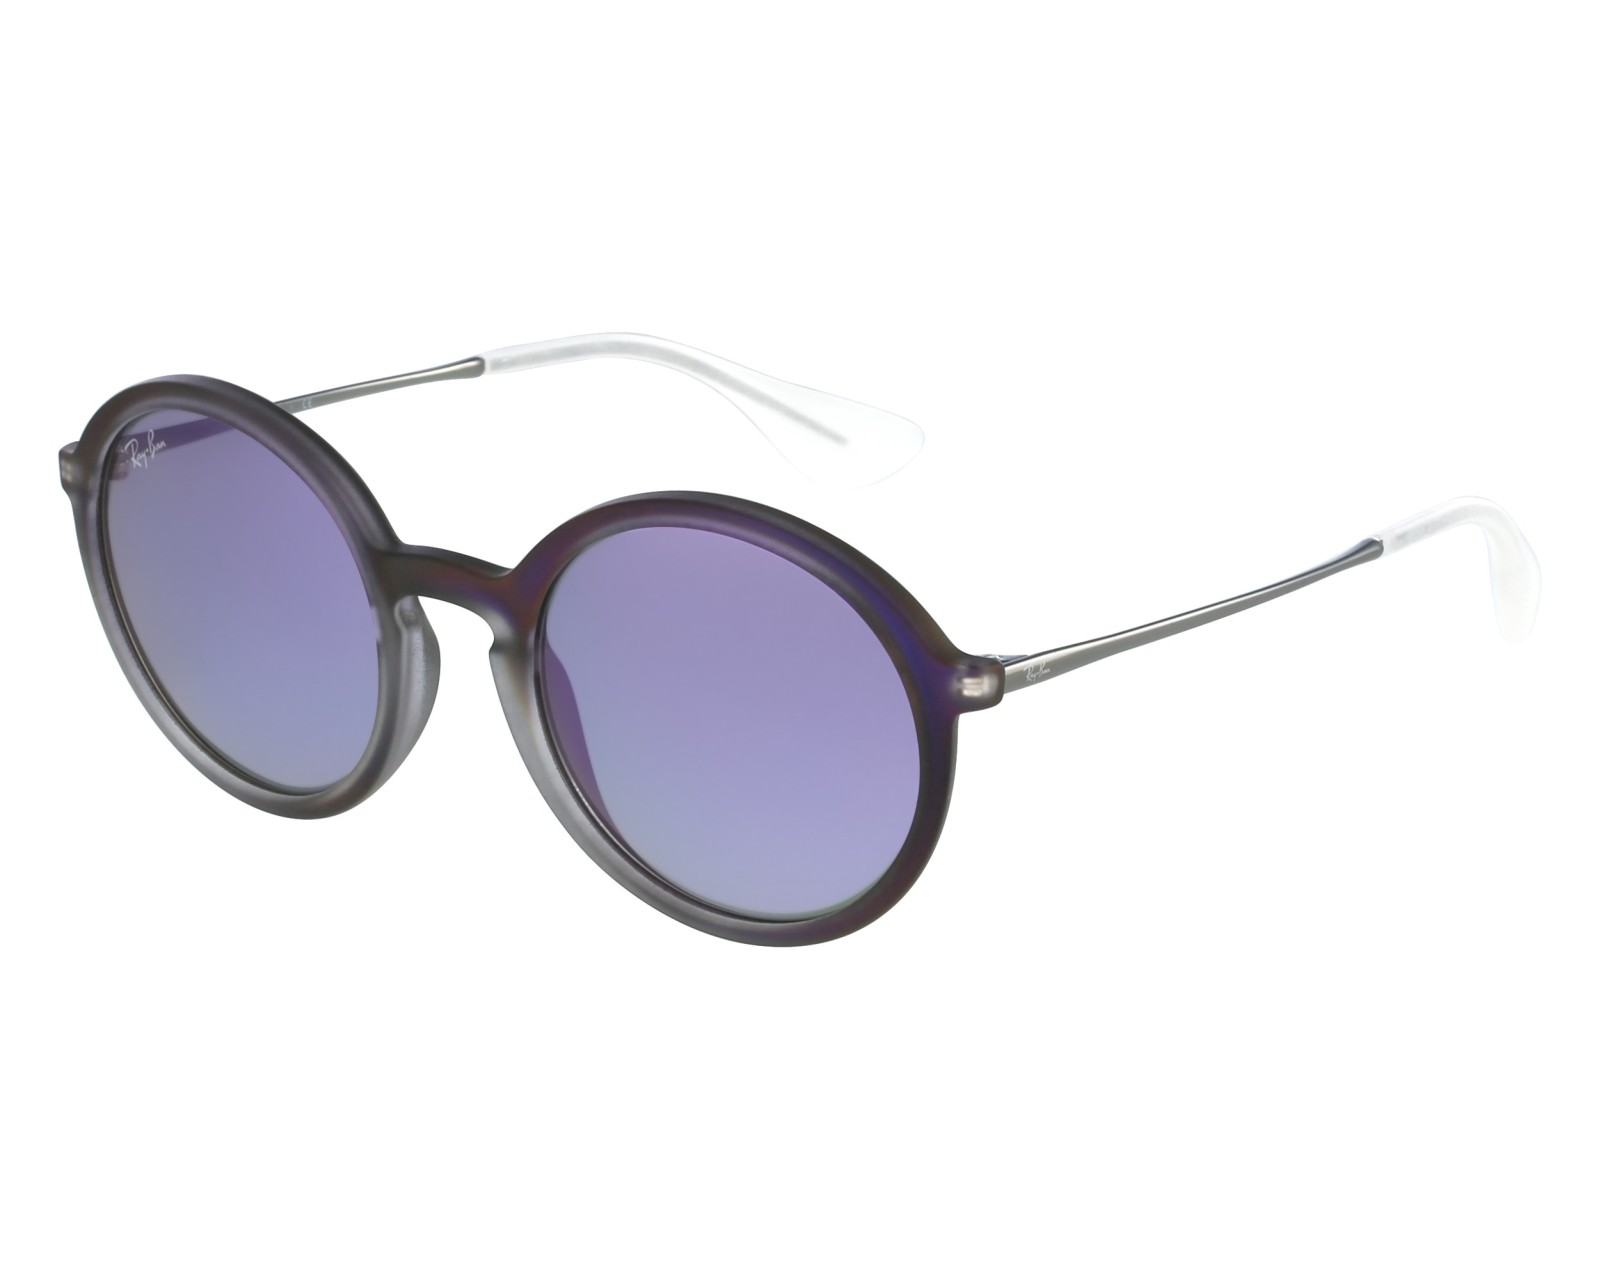 505d3ec827 thumbnail Sunglasses Ray-Ban RB-4222 6168 4V - Purple Gun front view